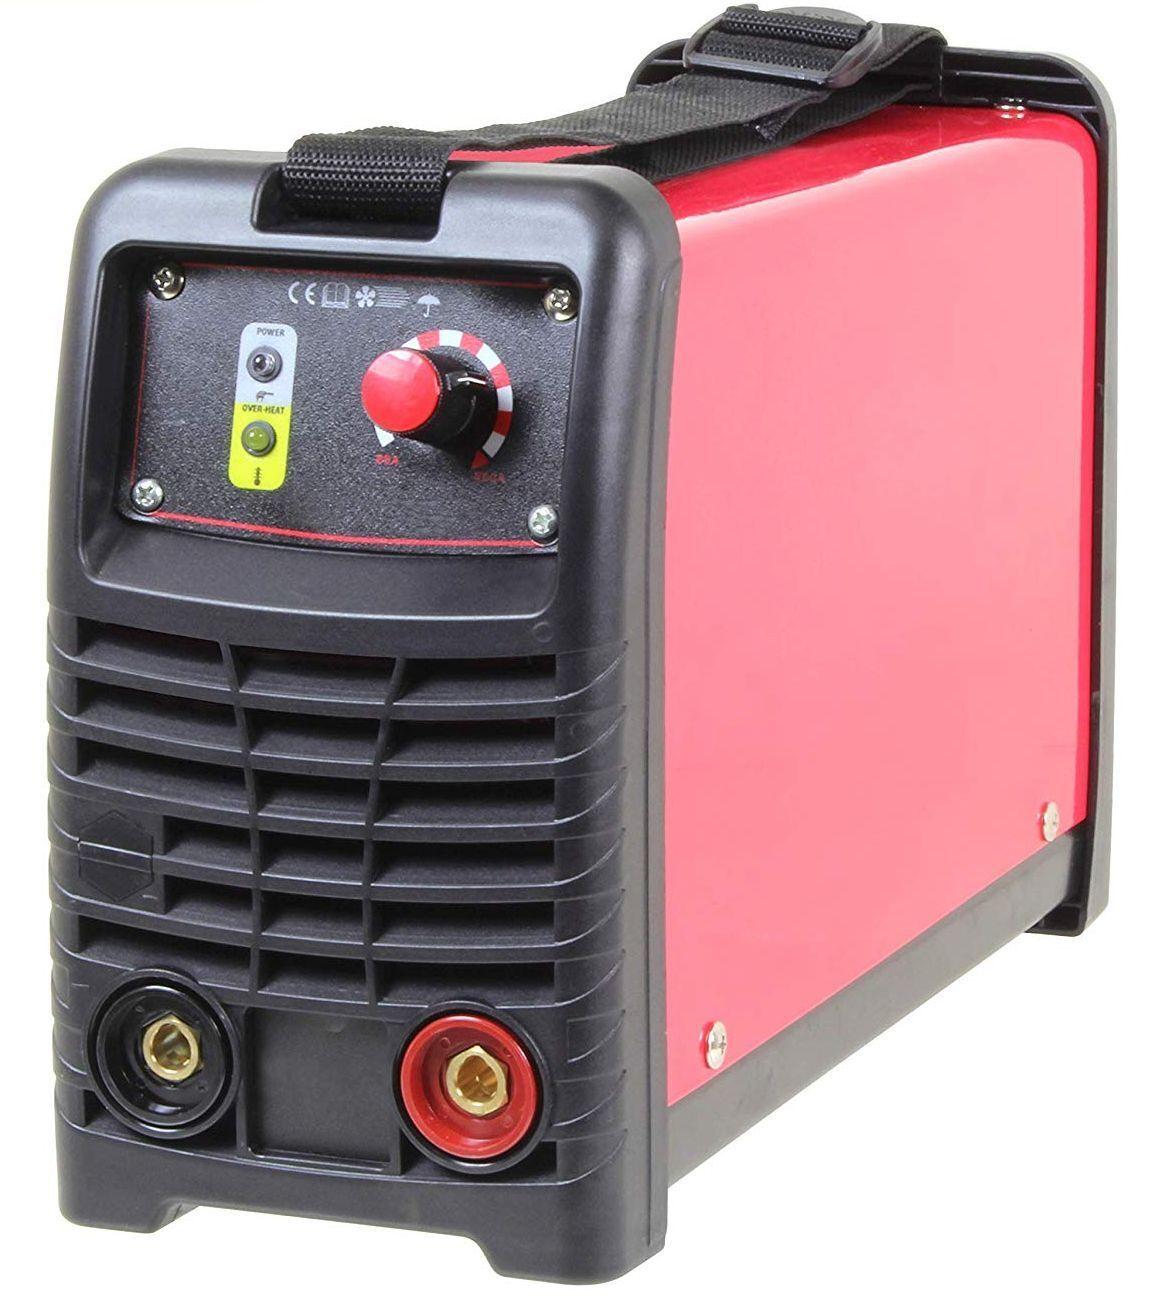 B-Ware Rothenberger Industrial Elektrodenschweißgerät RoWin 160 - 25-160 A